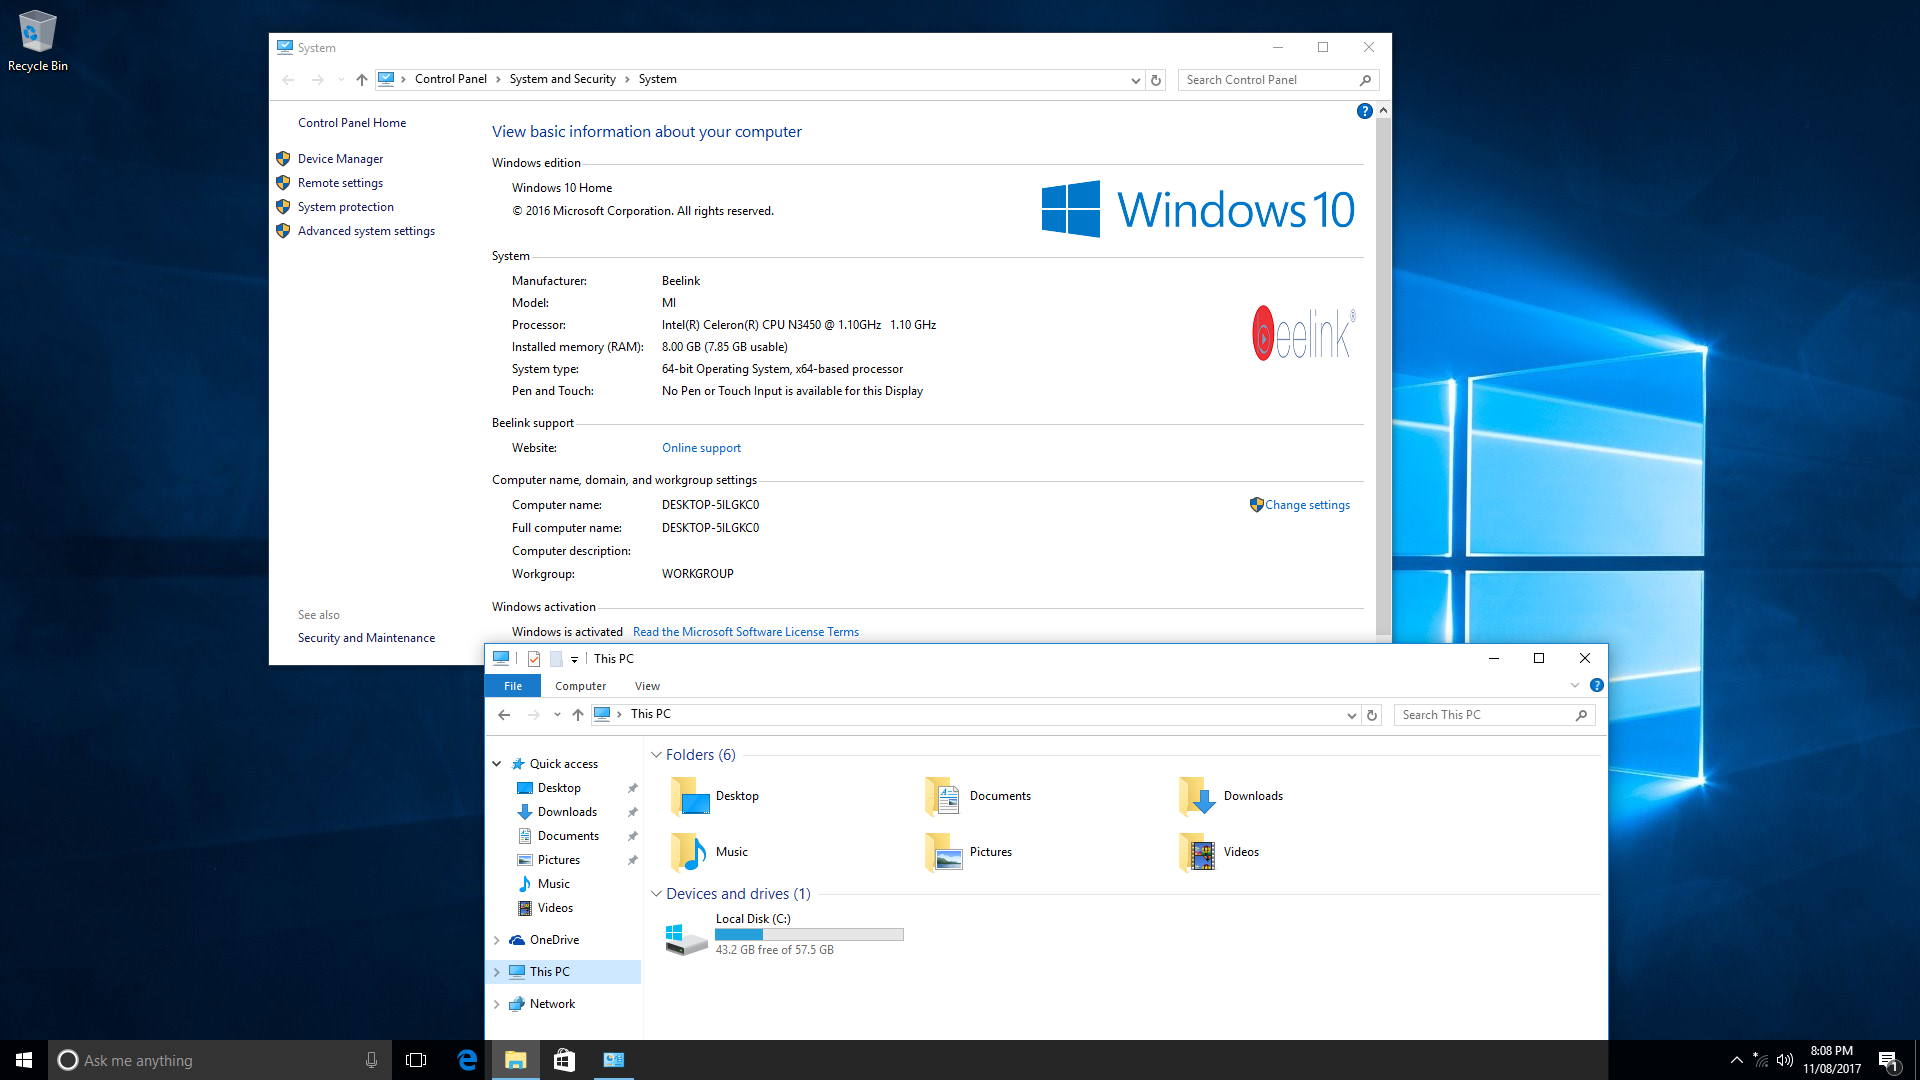 Beelink AP34 Ultimate Fanless mini PC Review with Windows 10 and Ubuntu